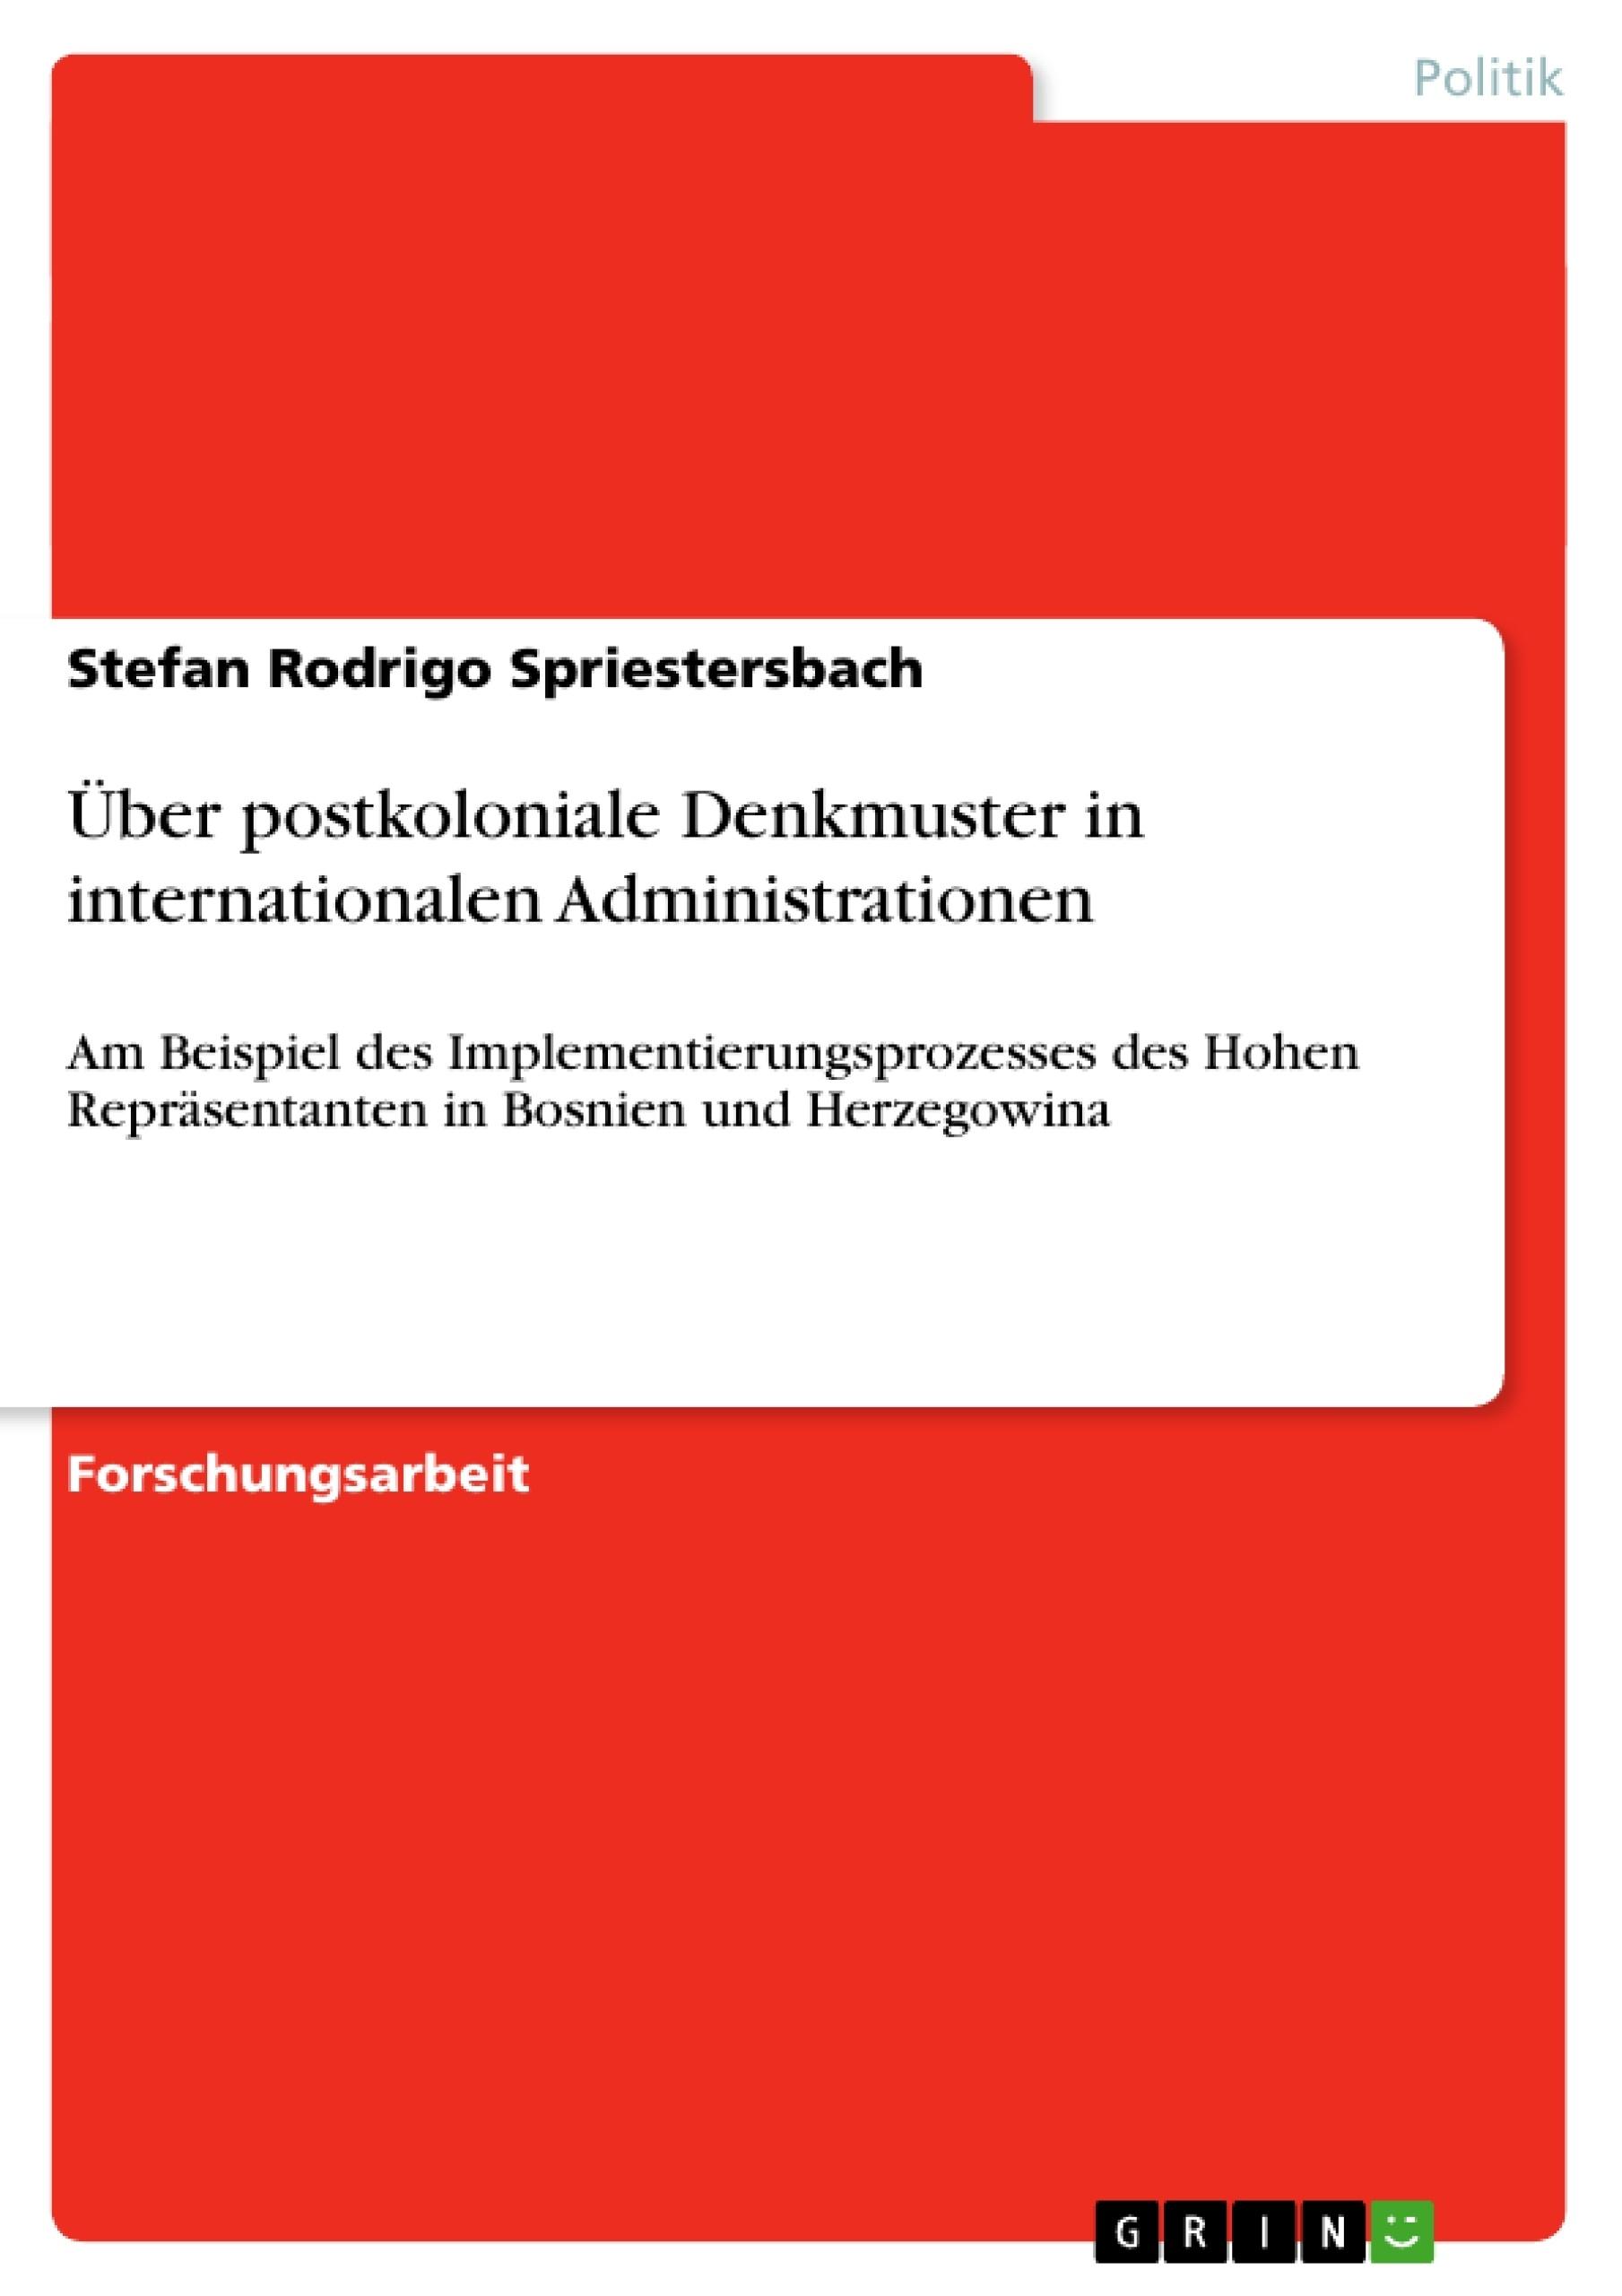 Titel: Über postkoloniale Denkmuster in internationalen Administrationen